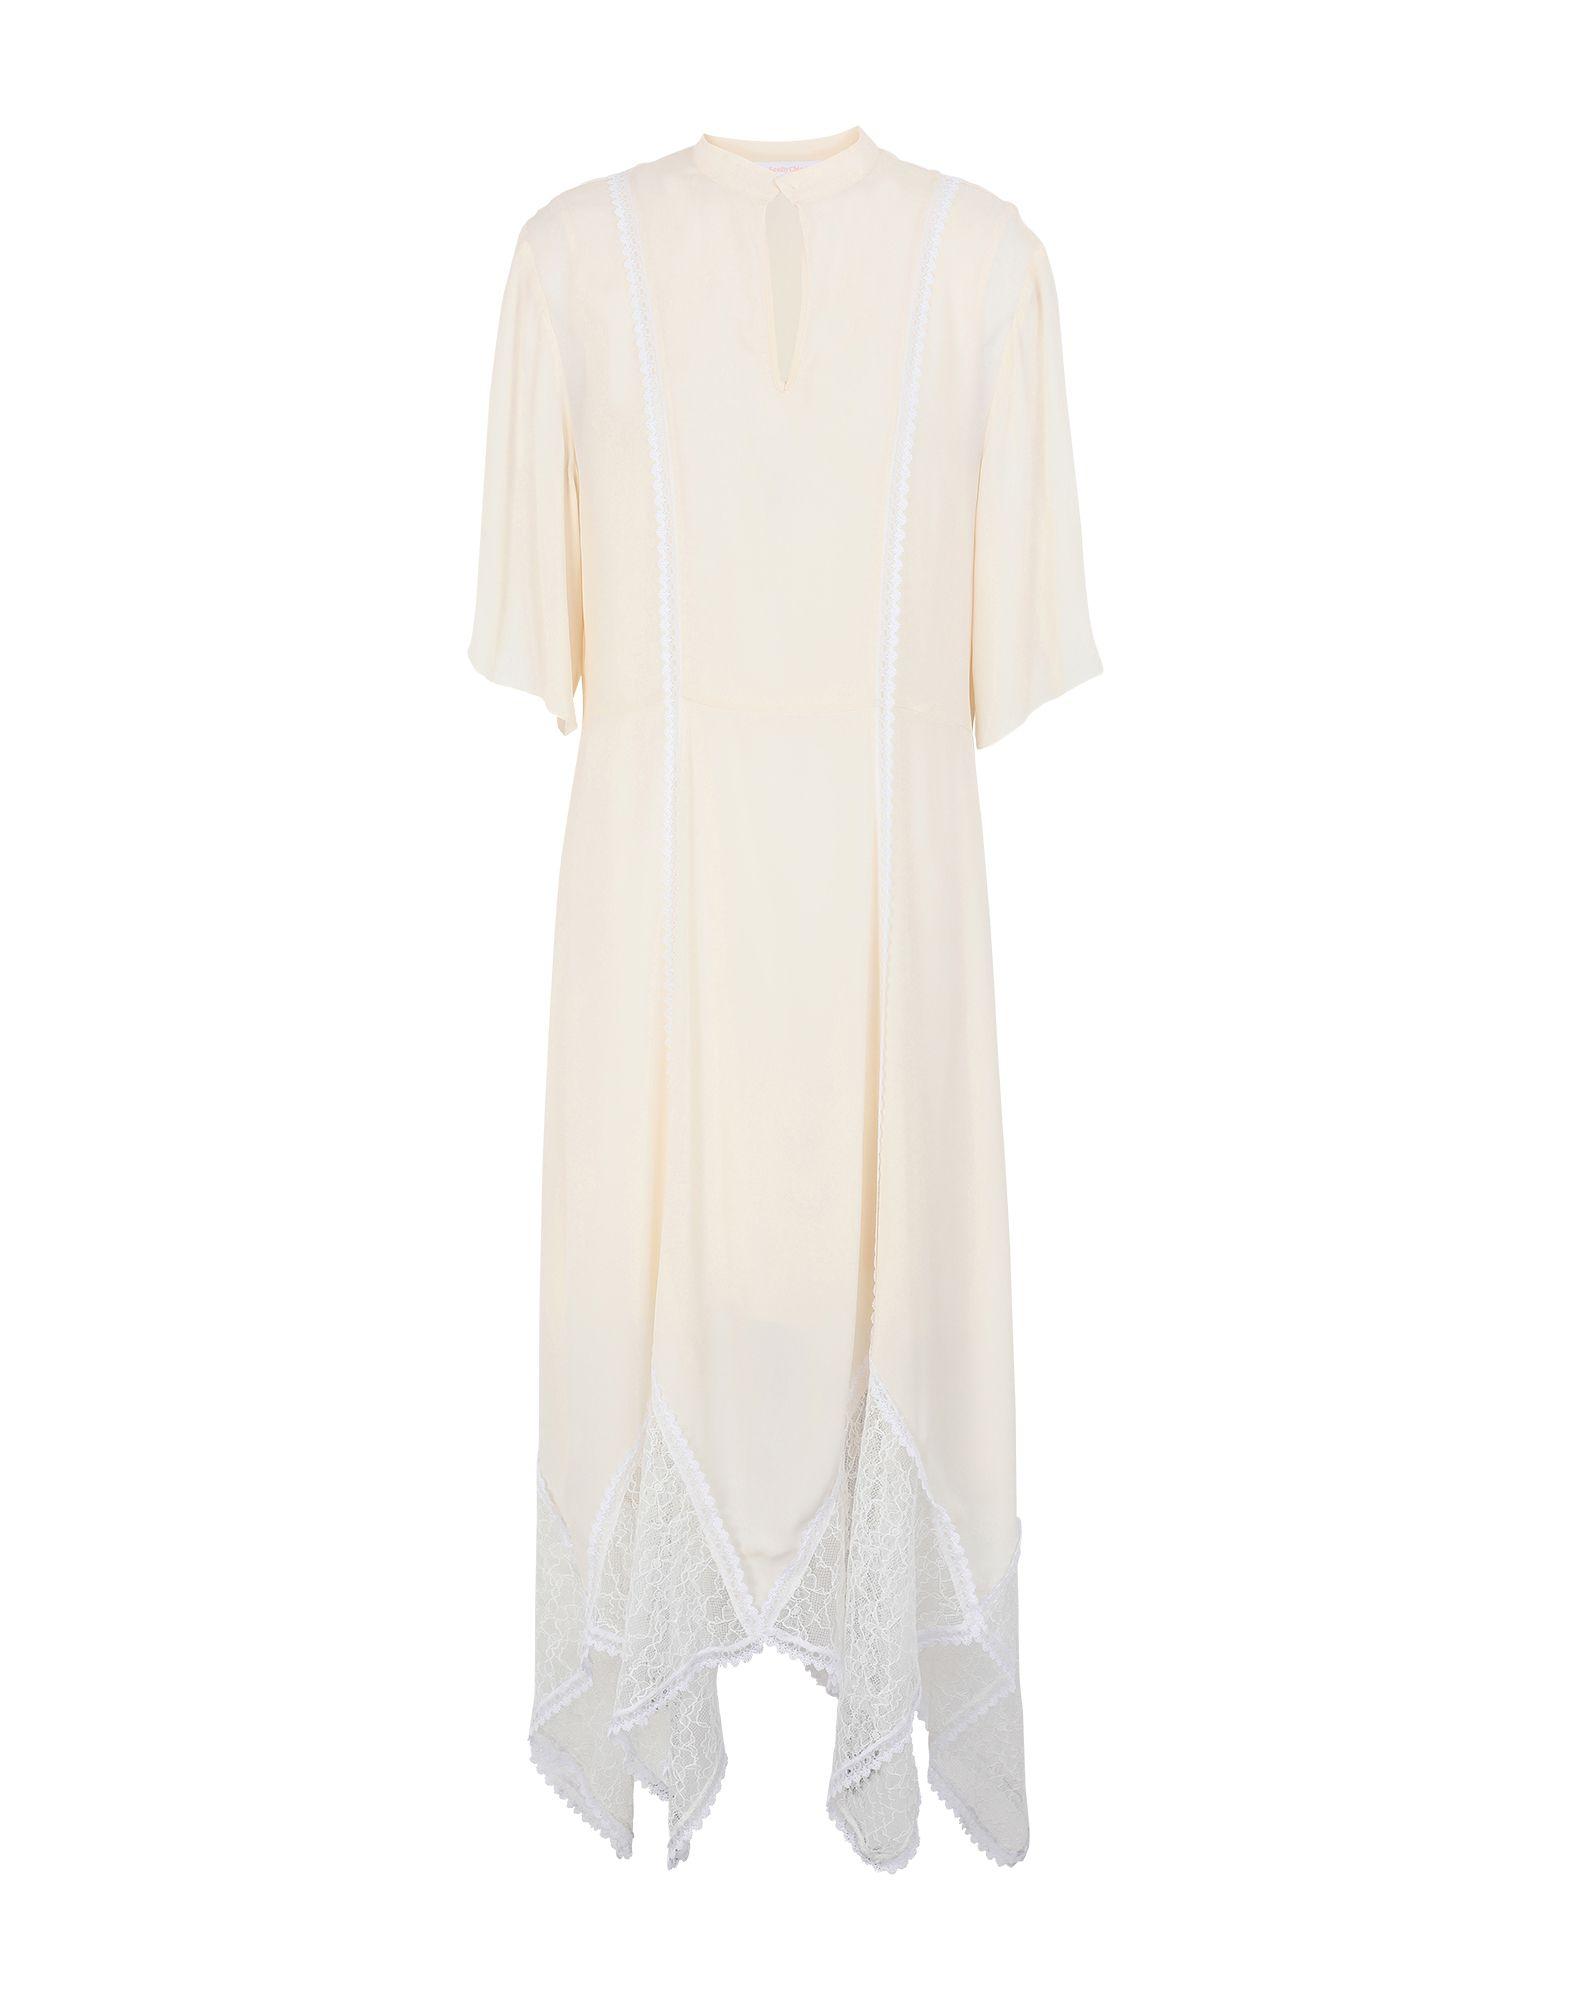 SEE BY CHLOÉ Платье длиной 3/4